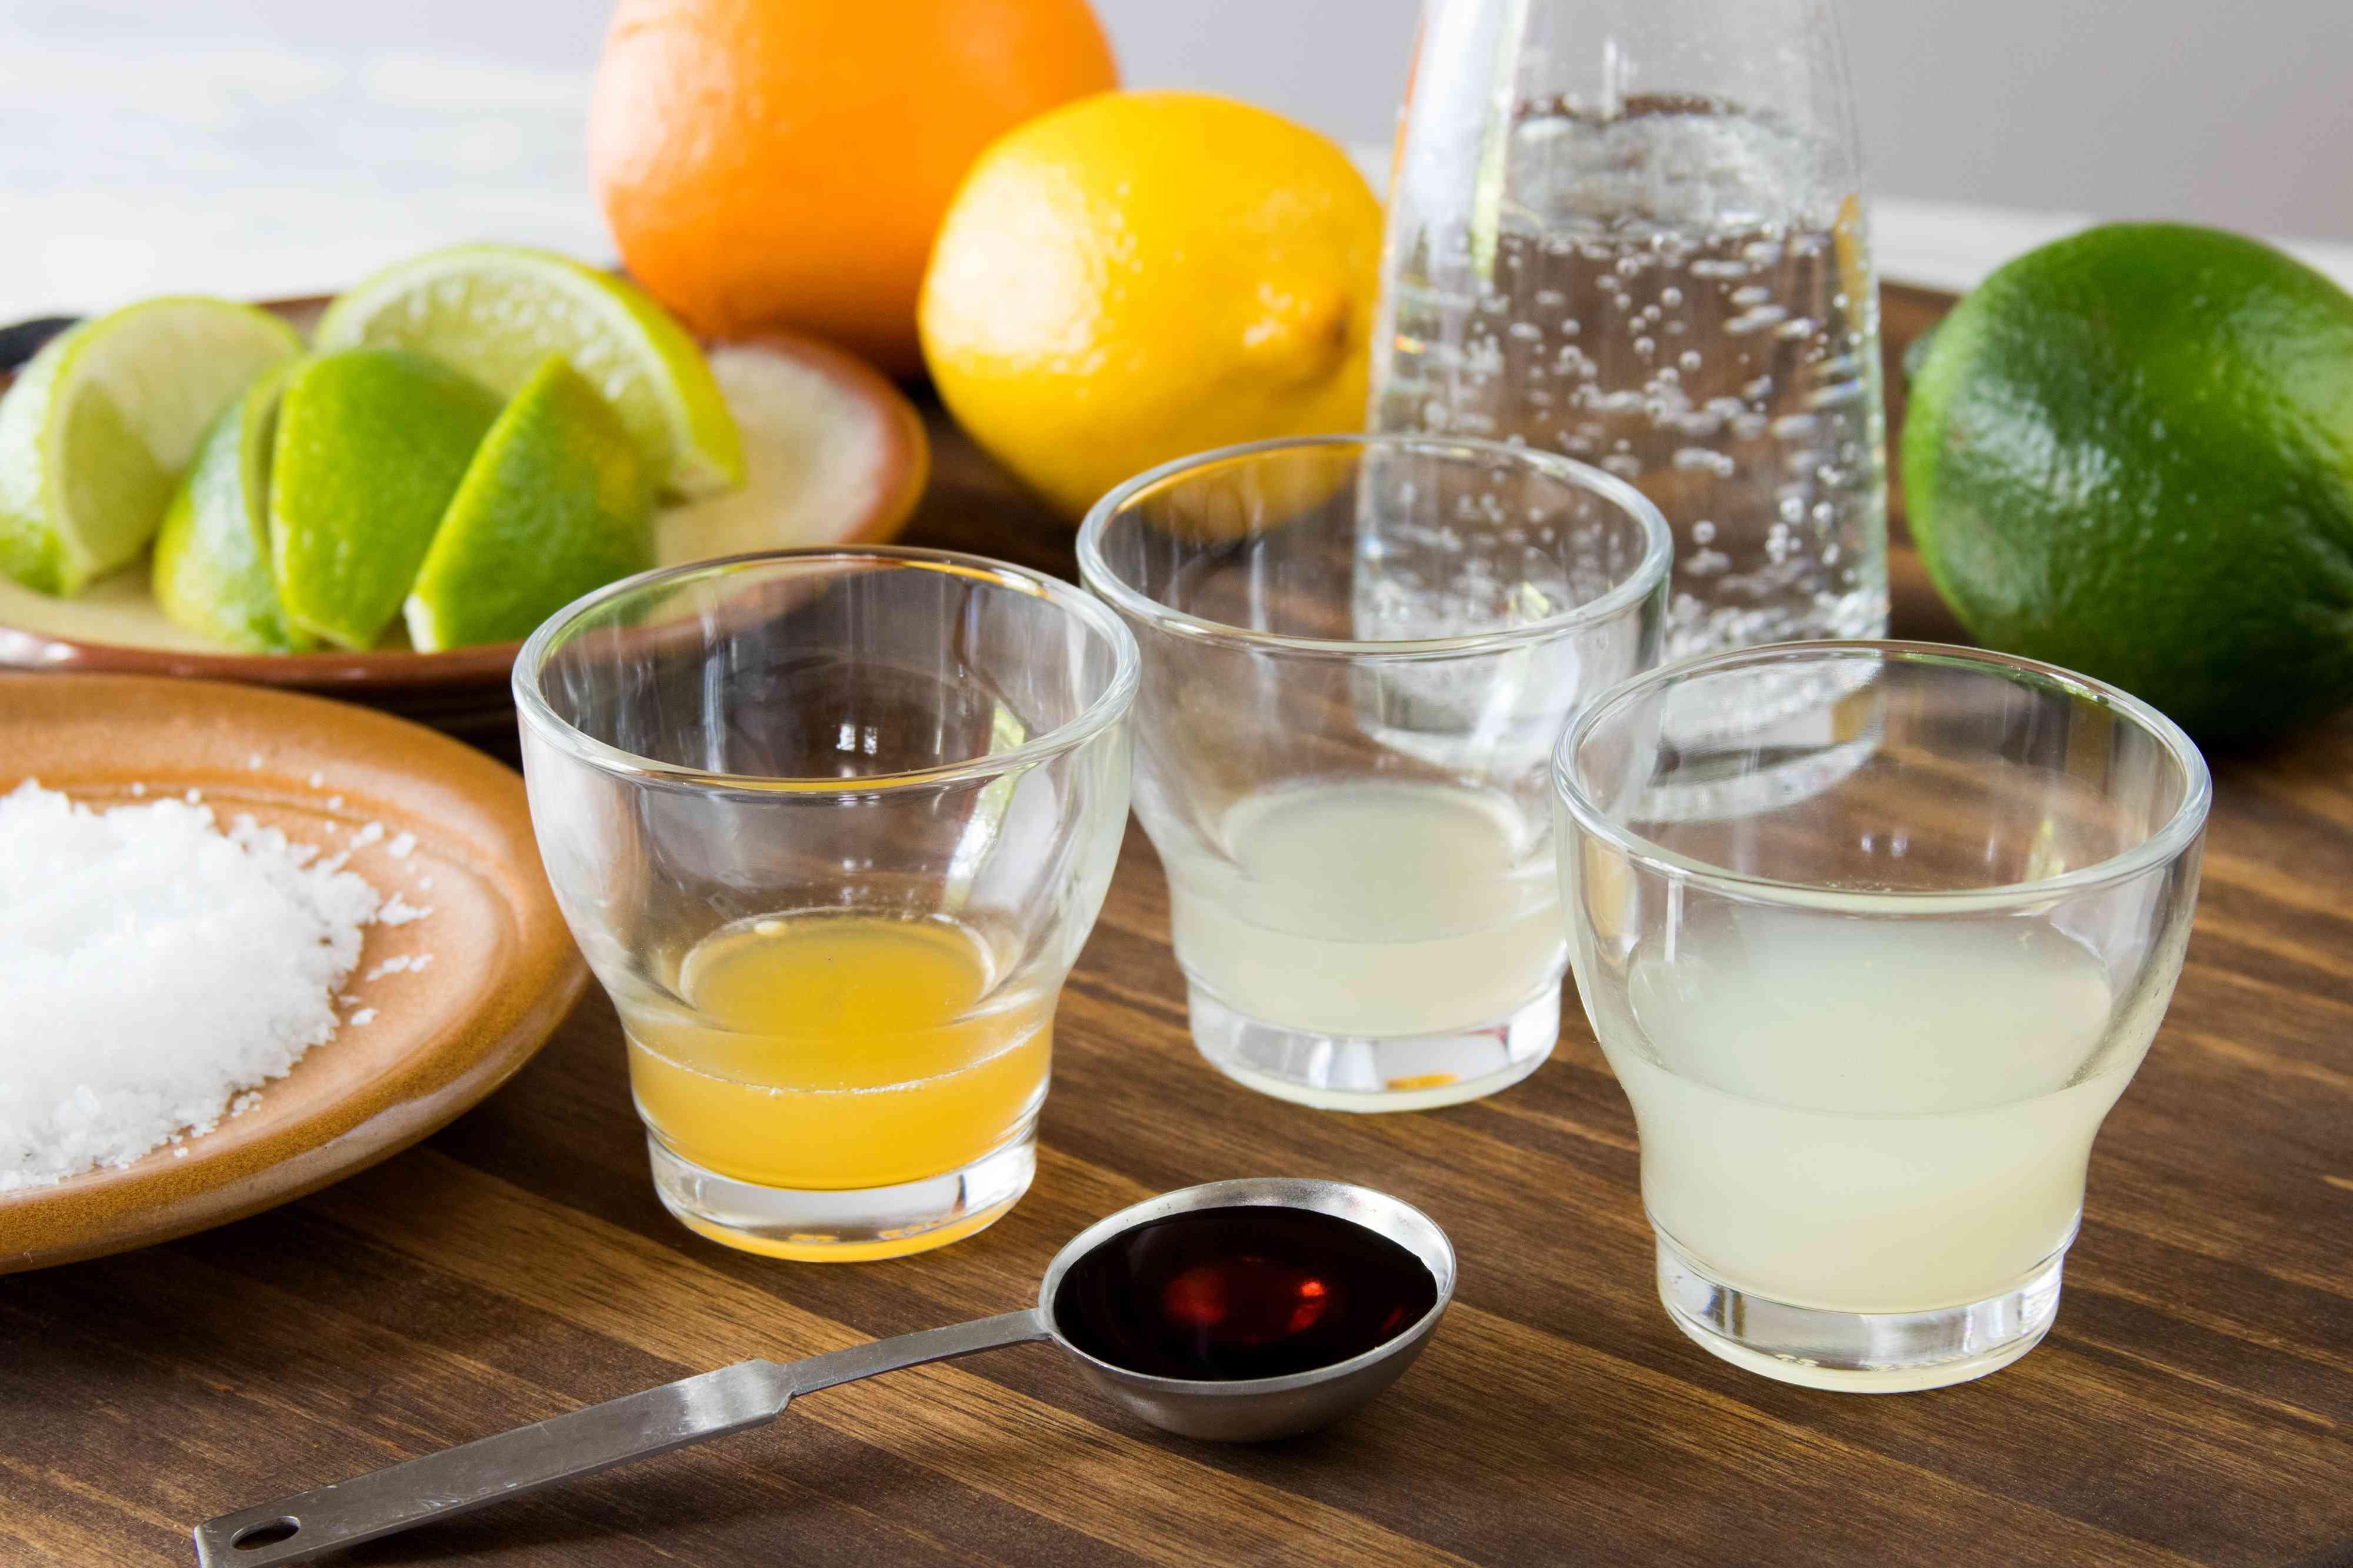 Ingredients for a Fresh Virgin Margarita